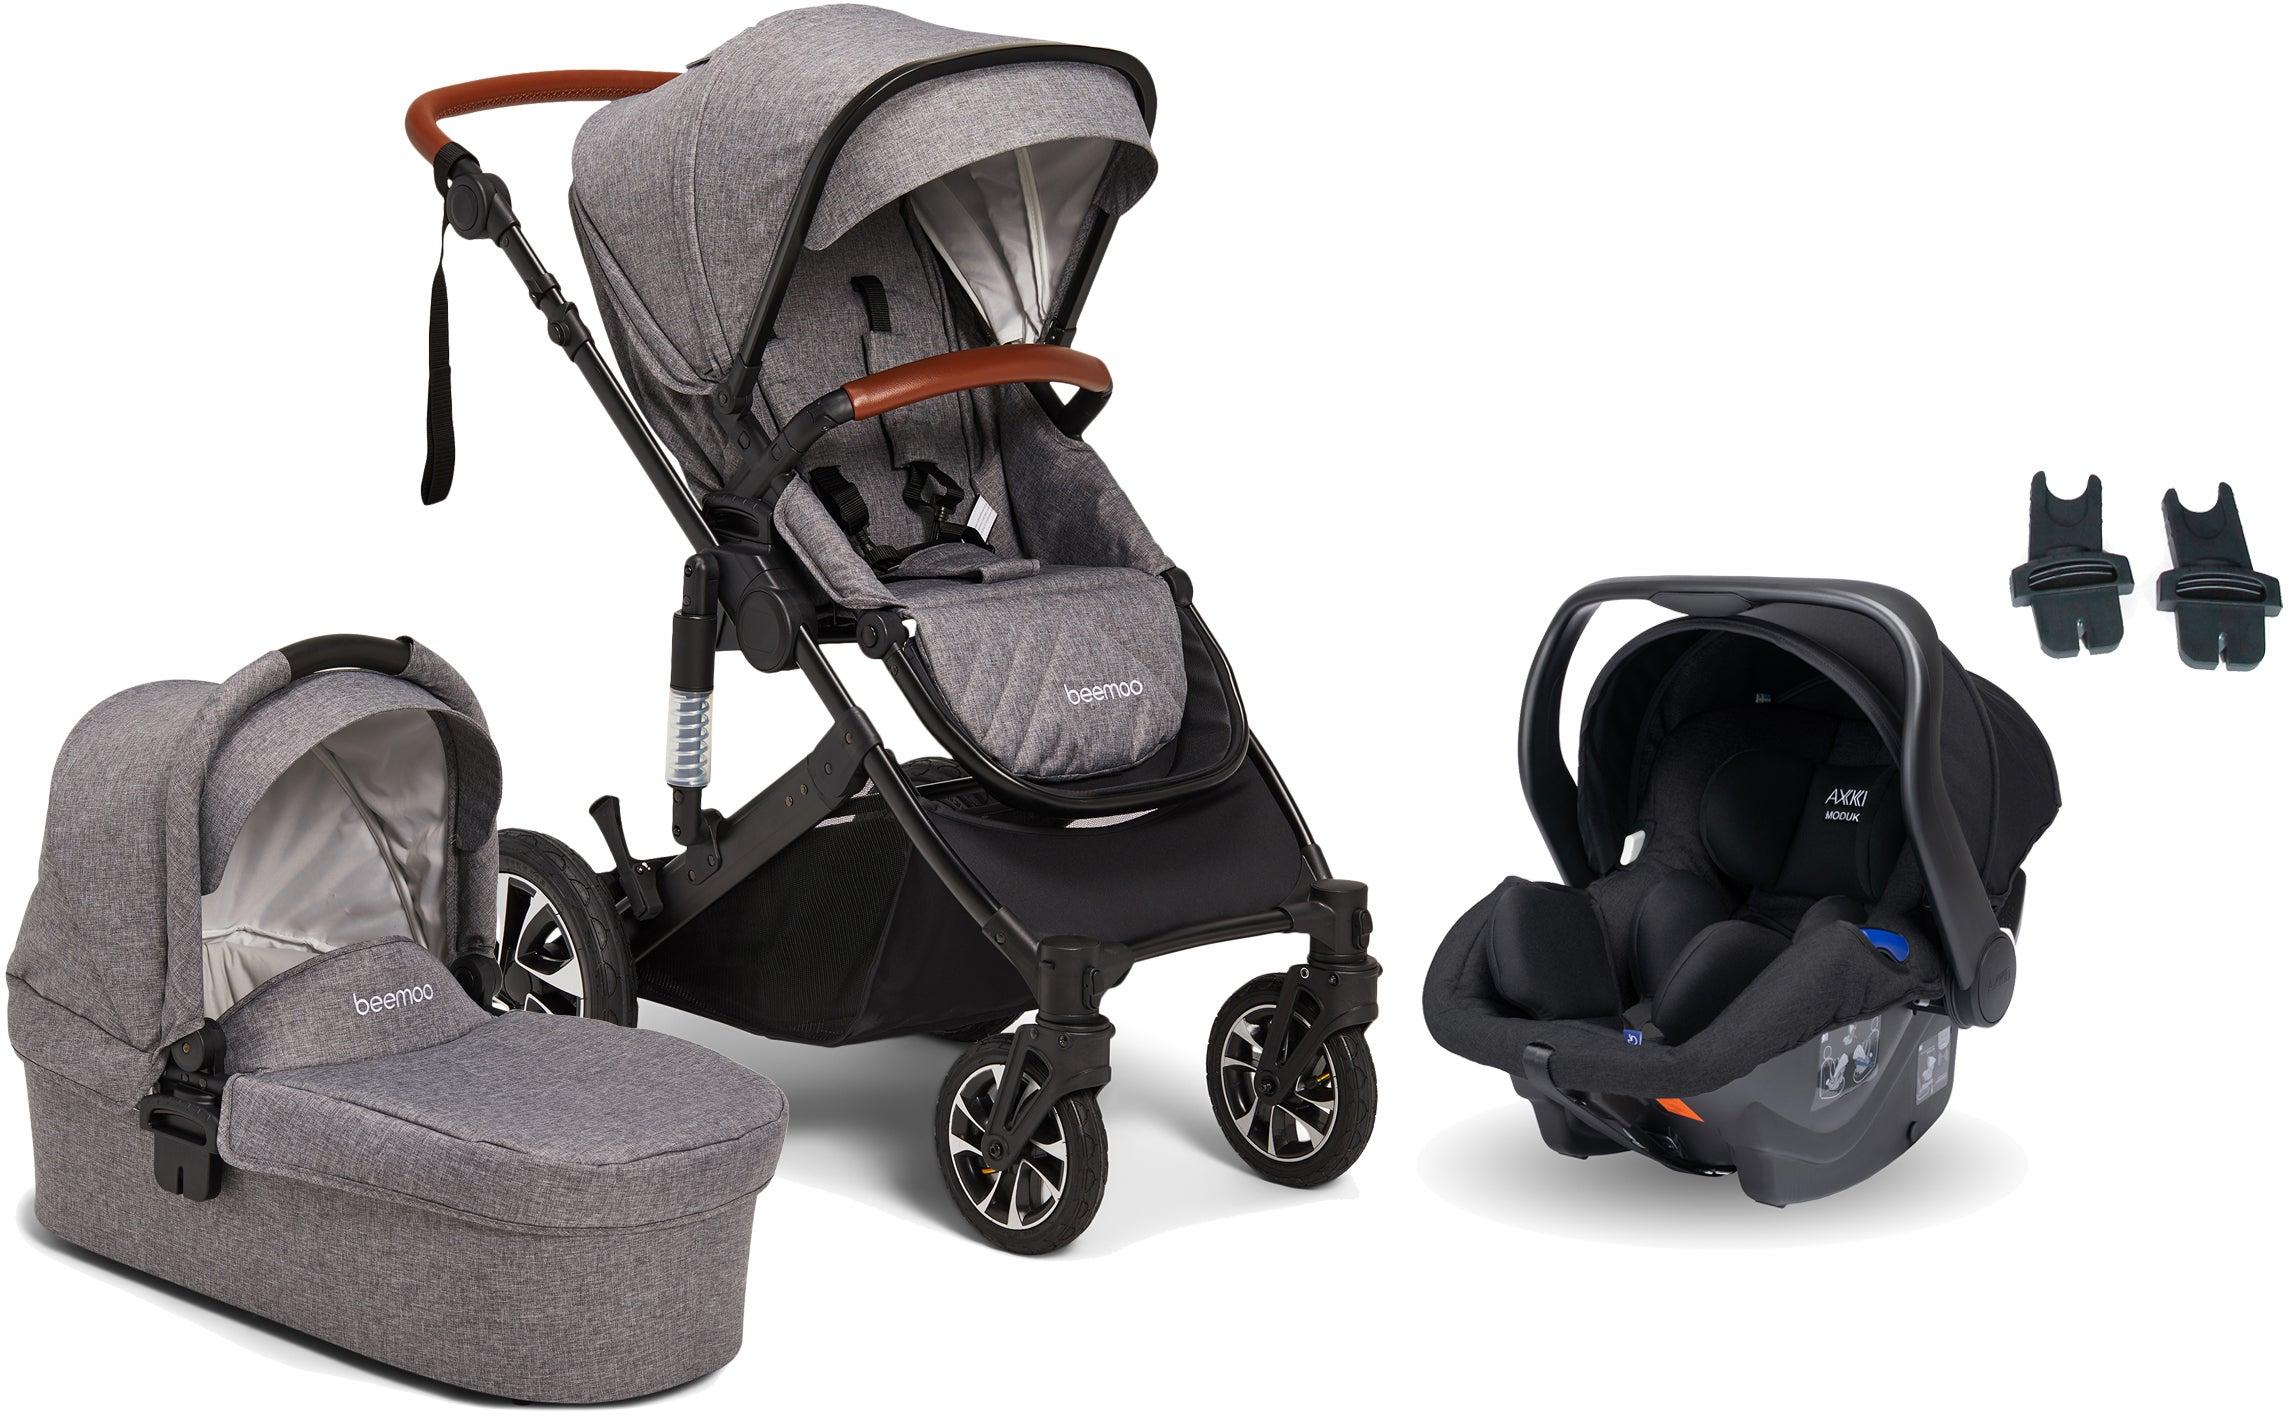 Beemoo Maxi 4 Yhdistelmävaunut Sis. Axkid Modukid Infant Turvakaukalo, Grey/Black